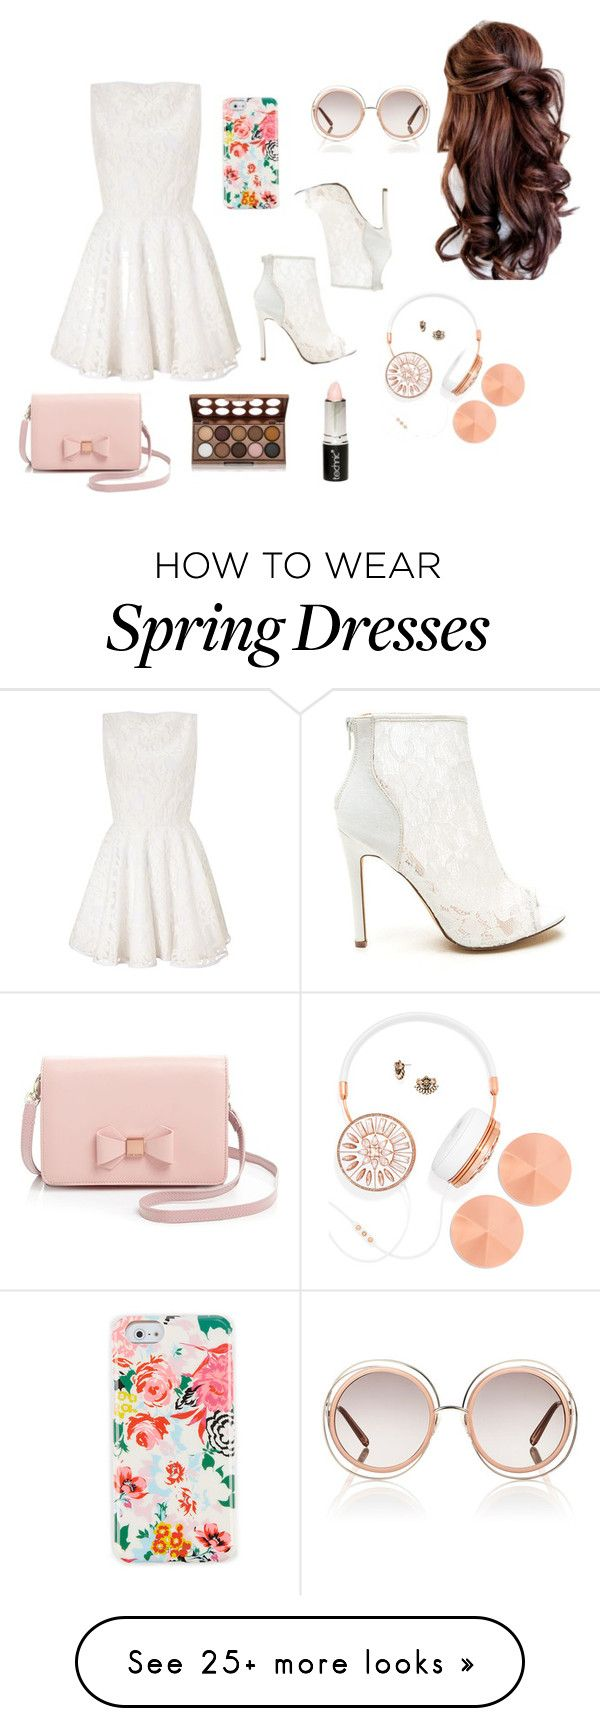 """Spring"" by ally-bear12 on Polyvore featuring moda, Lipsy, ban.do, Chloé, BaubleBar, Boohoo, NYX e Ted Baker"